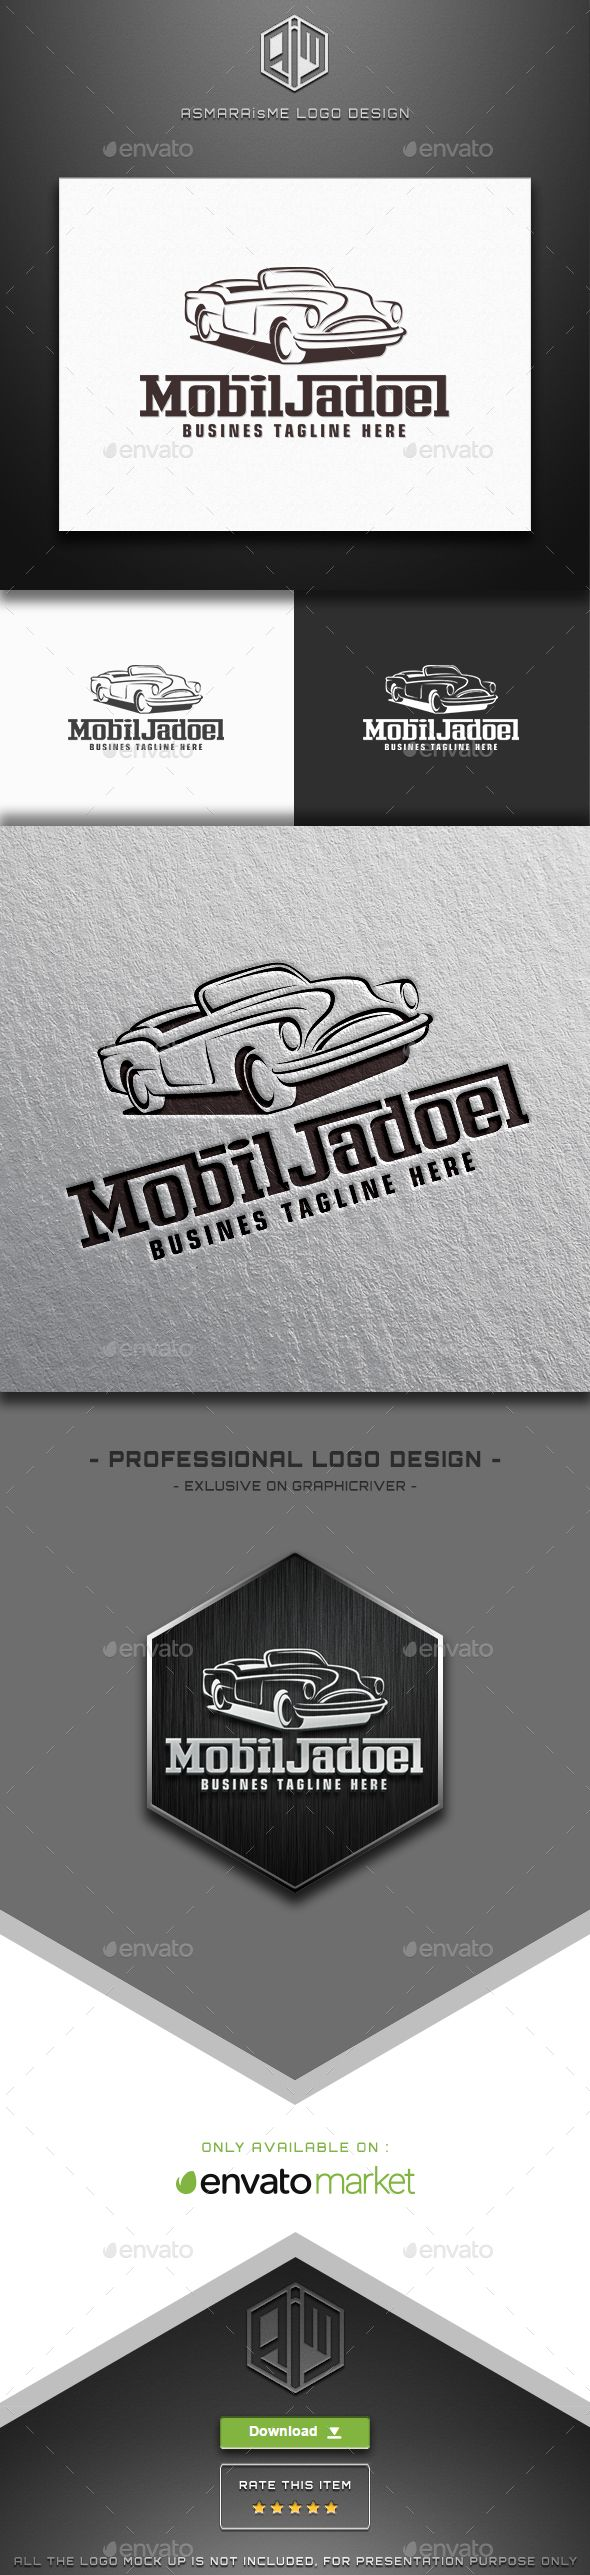 Mobil Jadoel - Vintage Car Logo | Car logos, Logos and Vector file